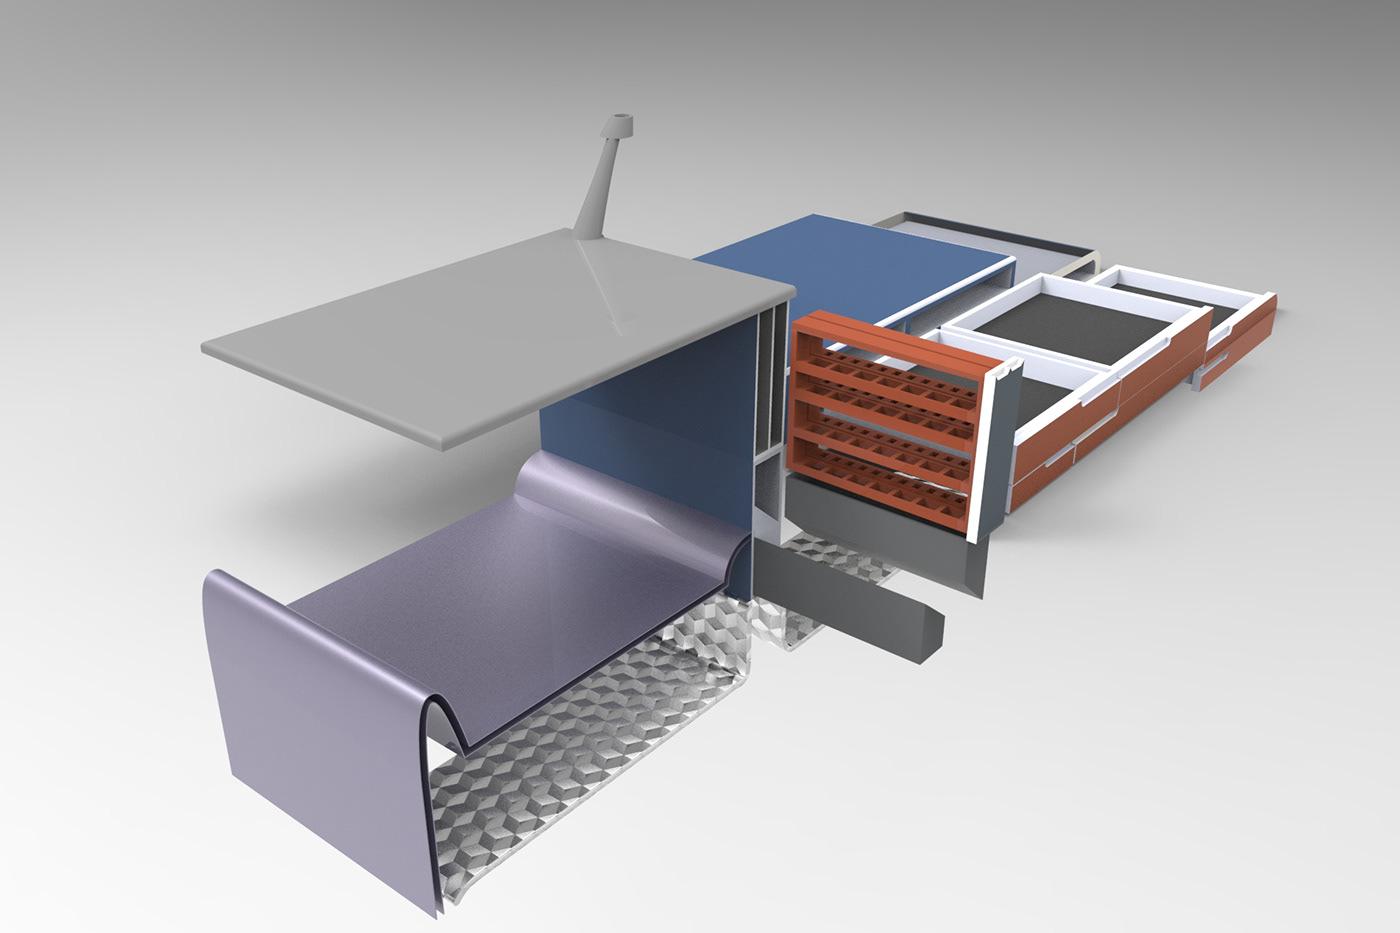 Rhealistic Workstation Design - Jewellery Designer on Behance